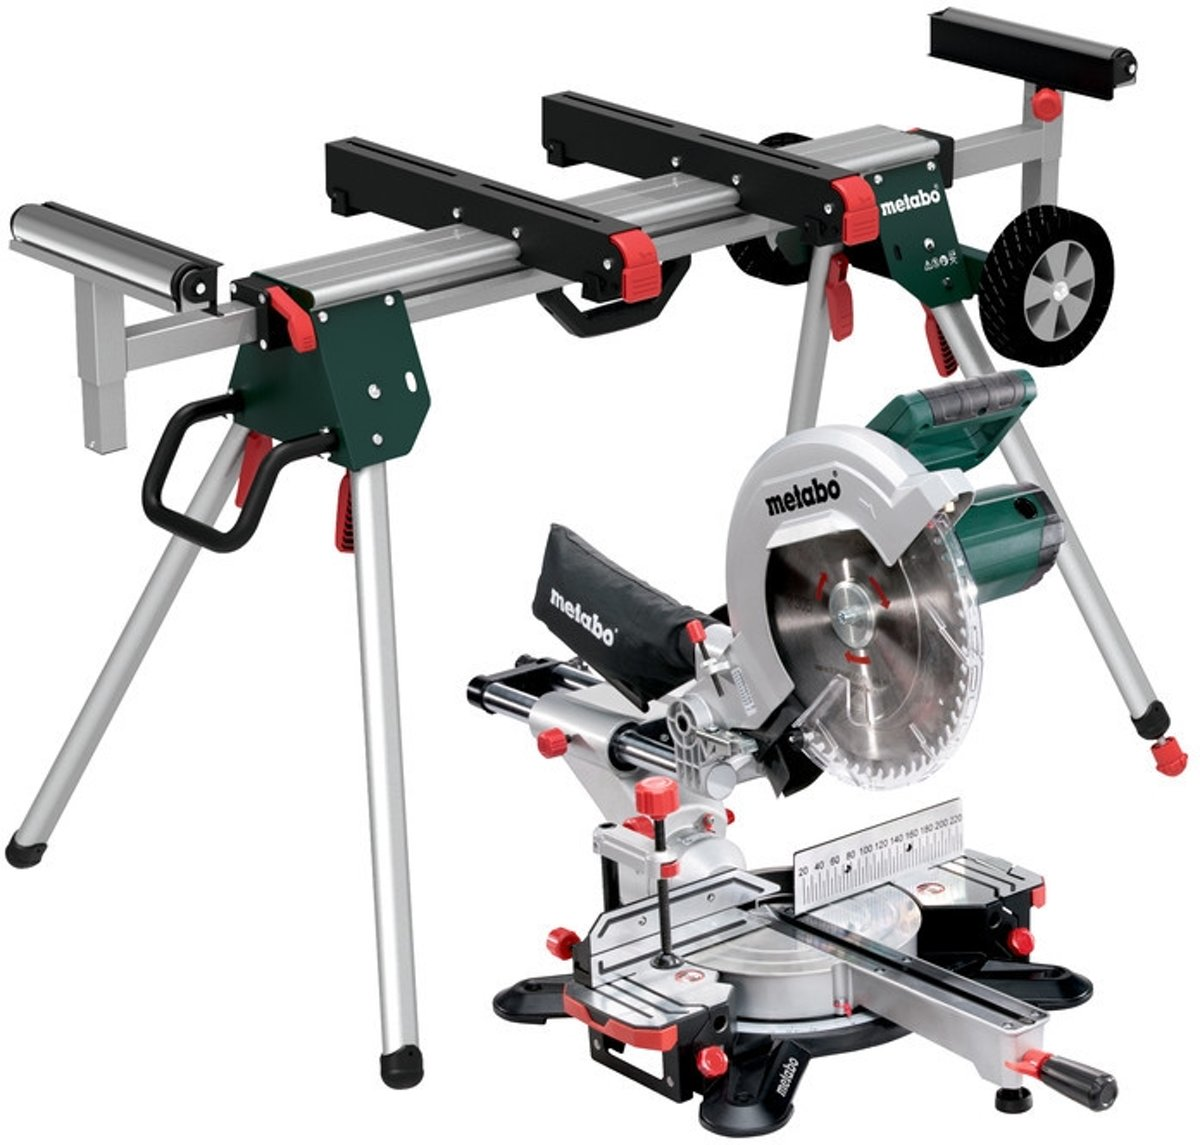 Metabo KGS 305 M Set Afkortzaag 305mm 1600 - 2000W + Machinestandaard KSU 251